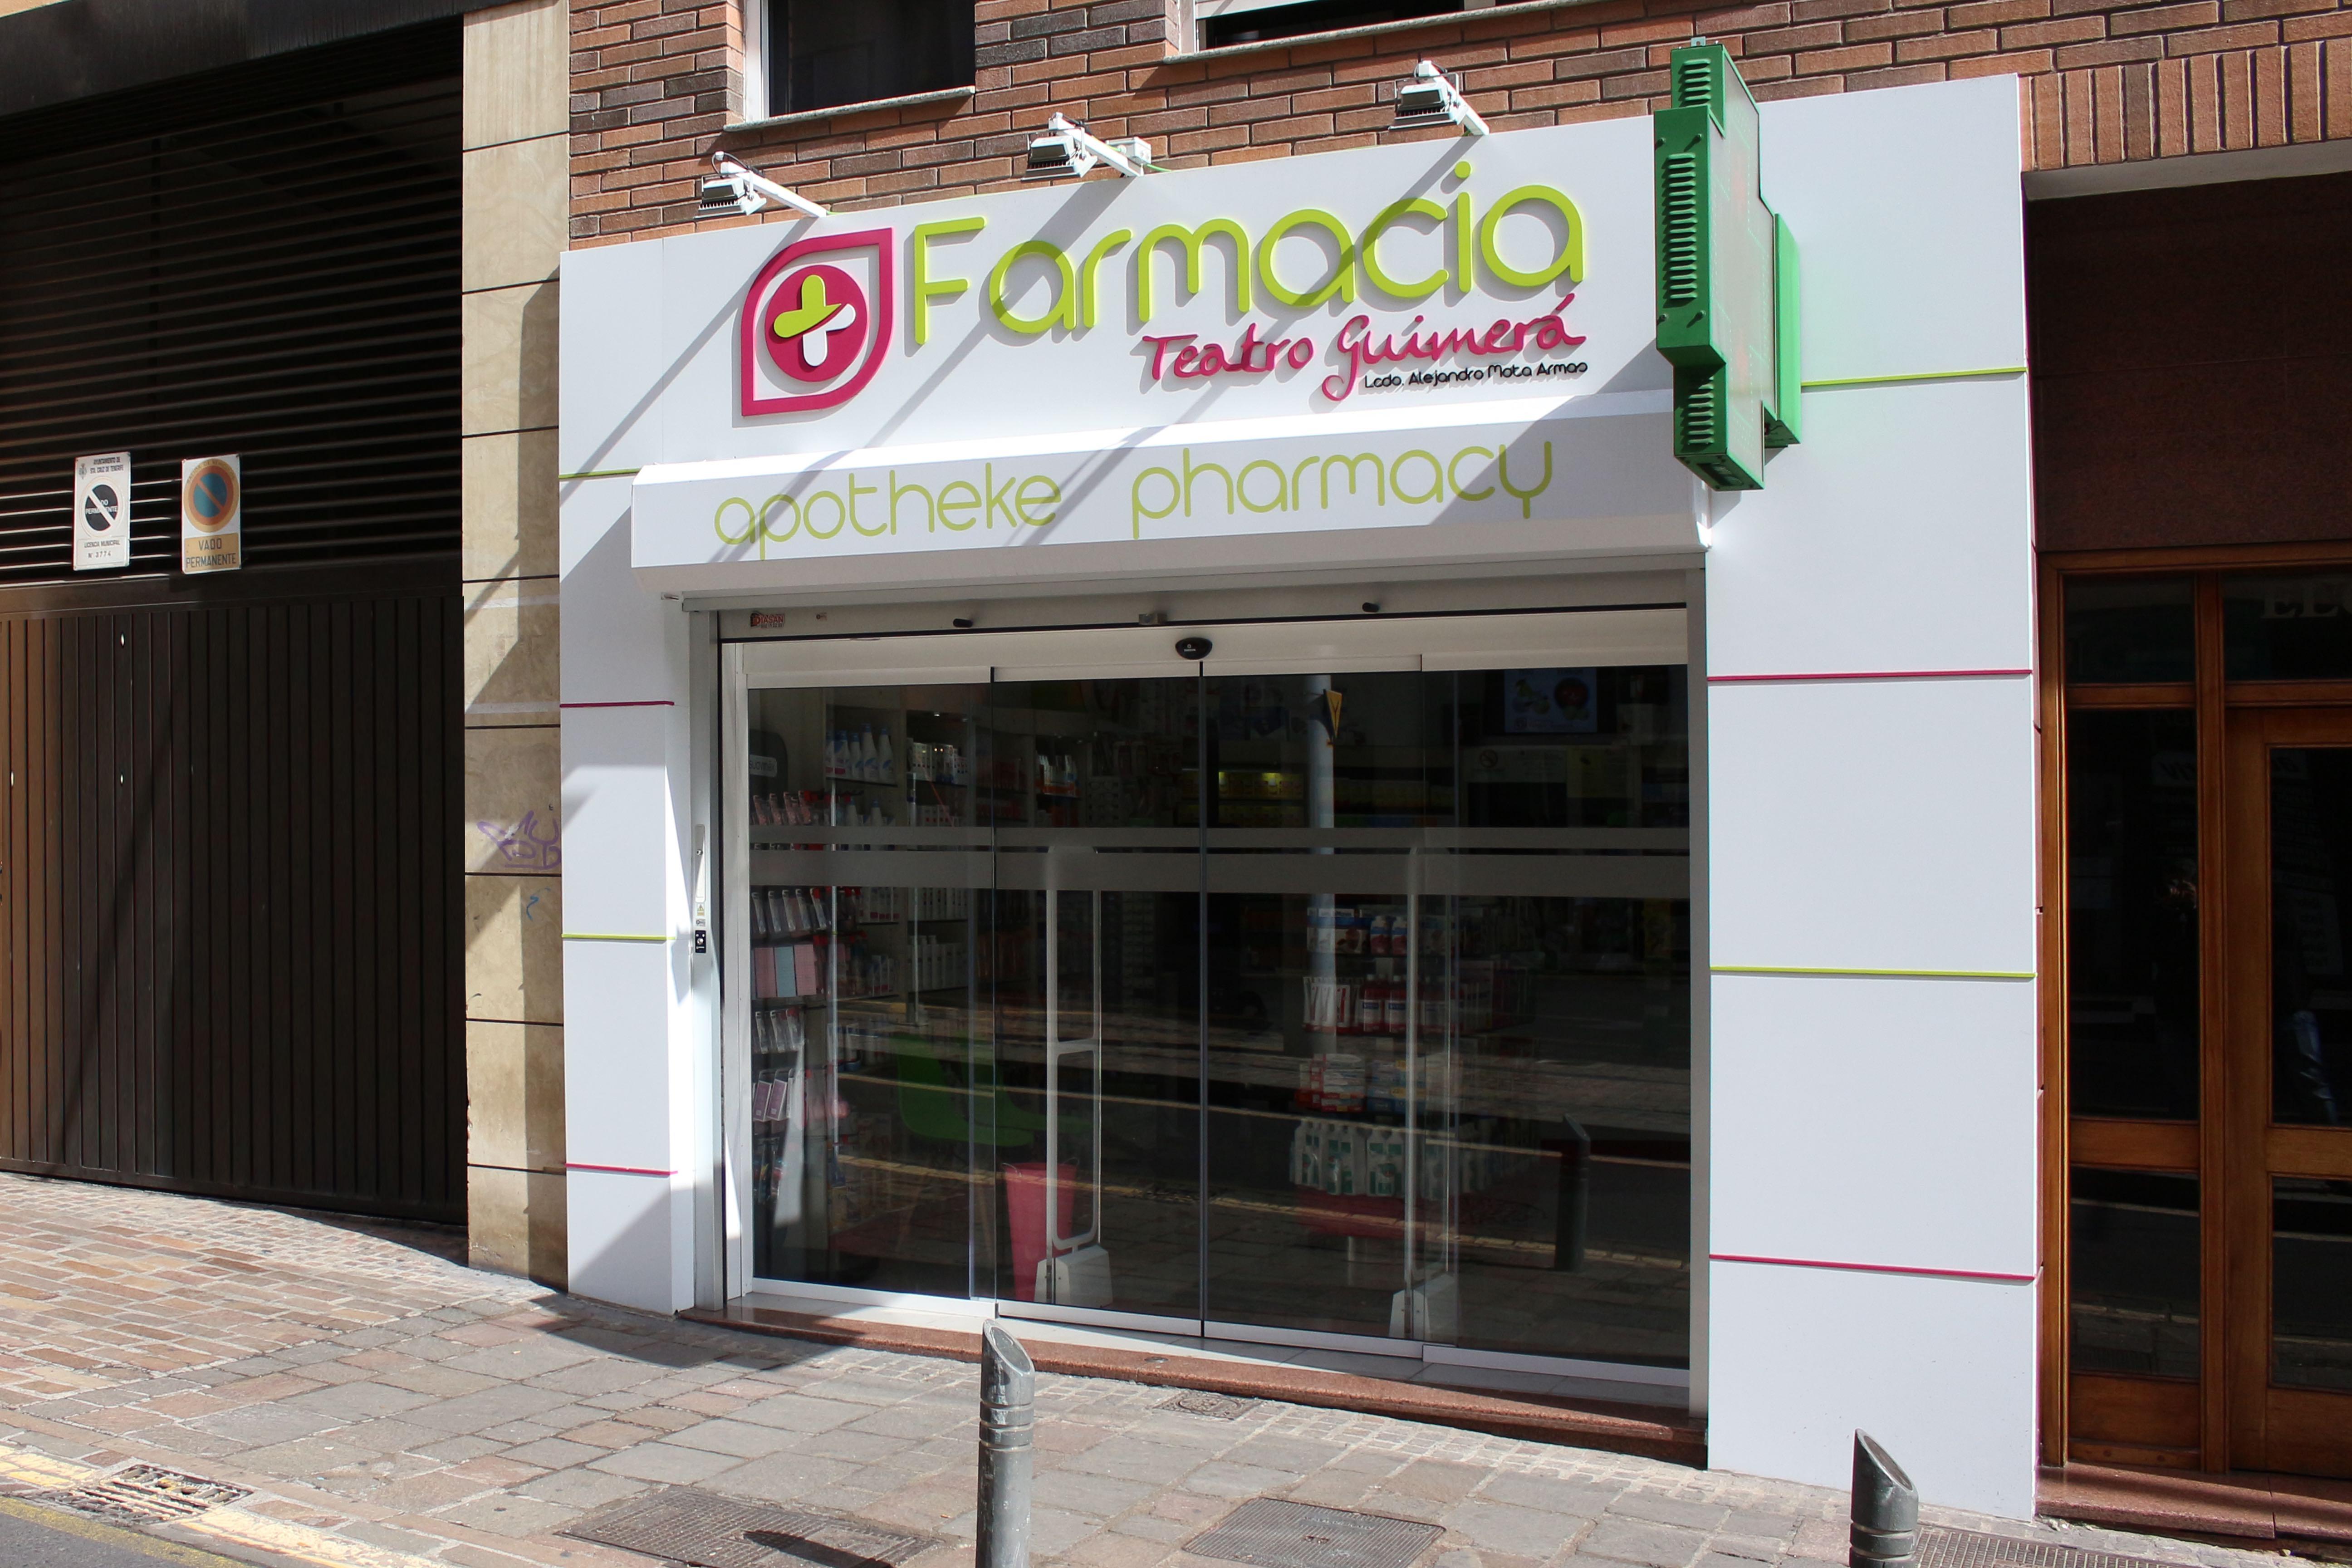 Renovación de fachada, textos corpóreos y composite, Farmacia Guimerá, Tenerife